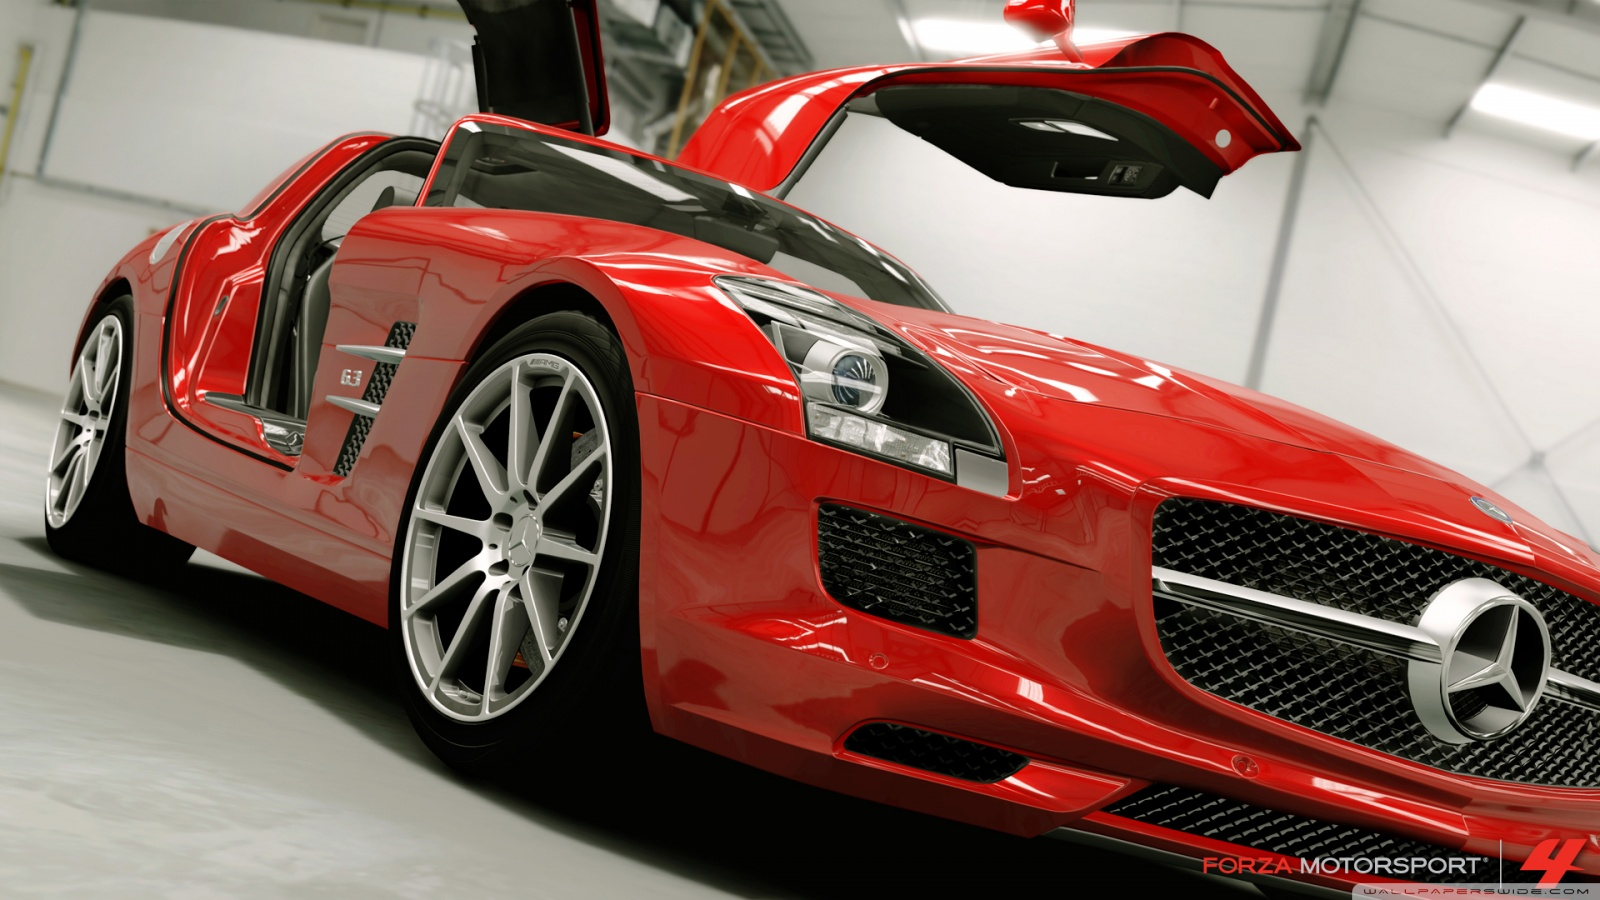 forza wallpaper,land vehicle,vehicle,car,sports car,automotive design